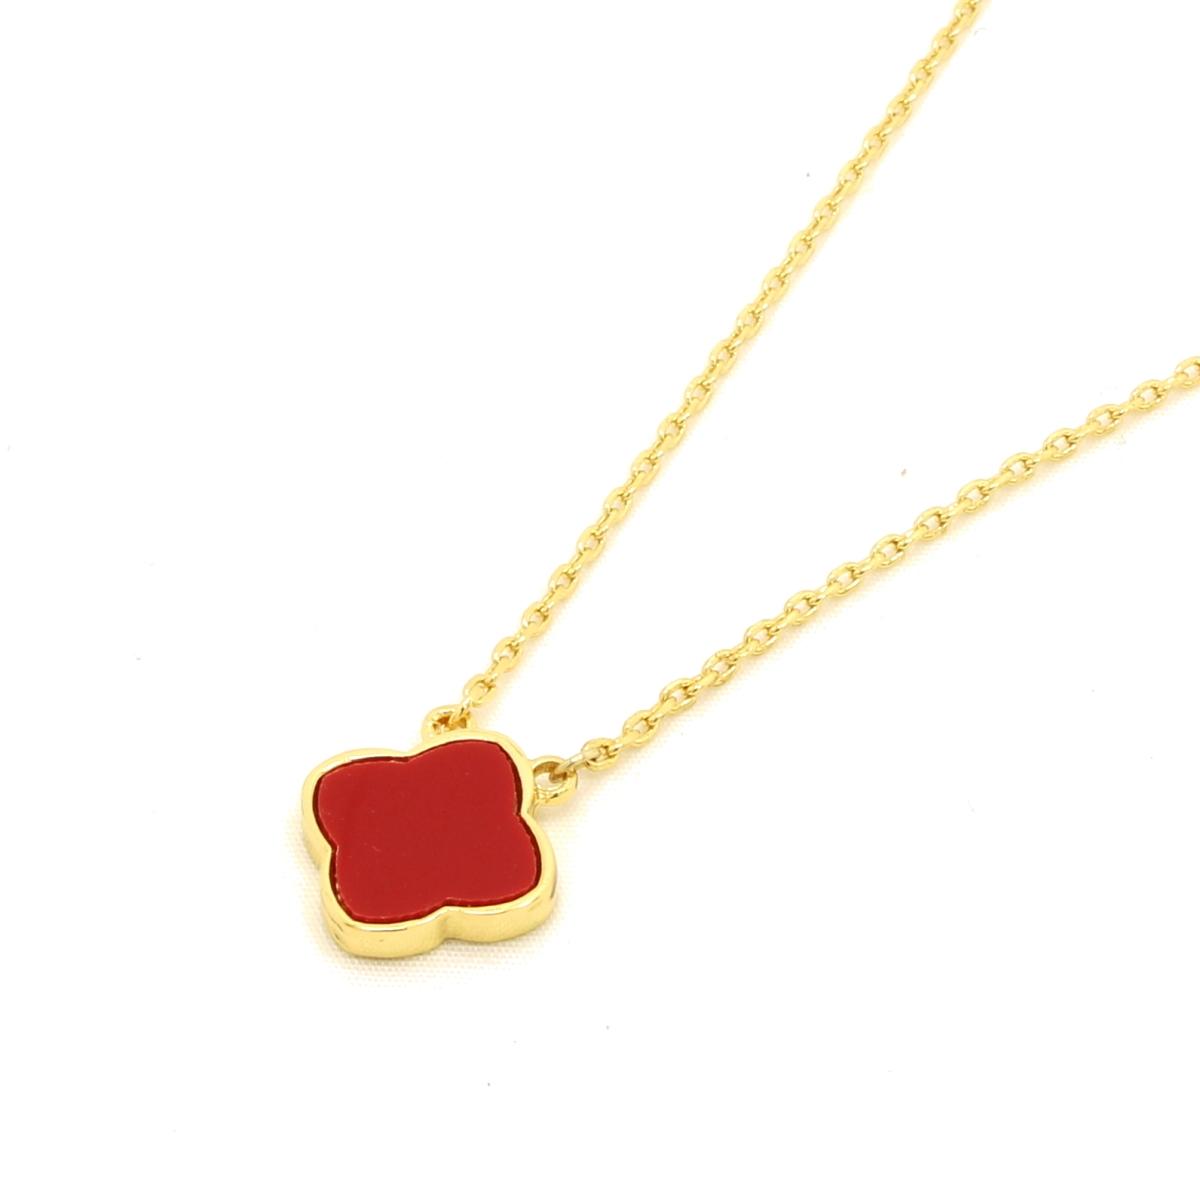 Hakuchobana Perlafiore Golden Flower Necklace Clover 1 Flower